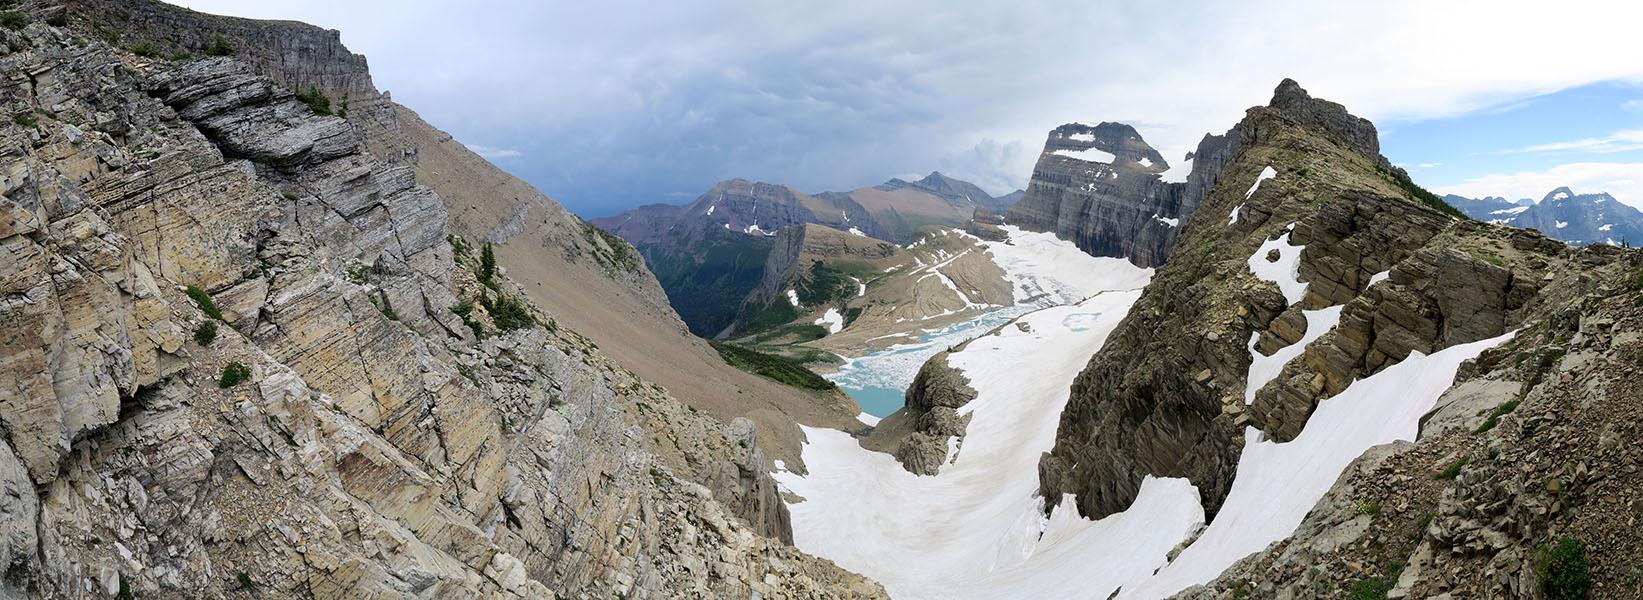 Garden Wall panorama [Garden Wall Trail, Glacier National Park, Montana]